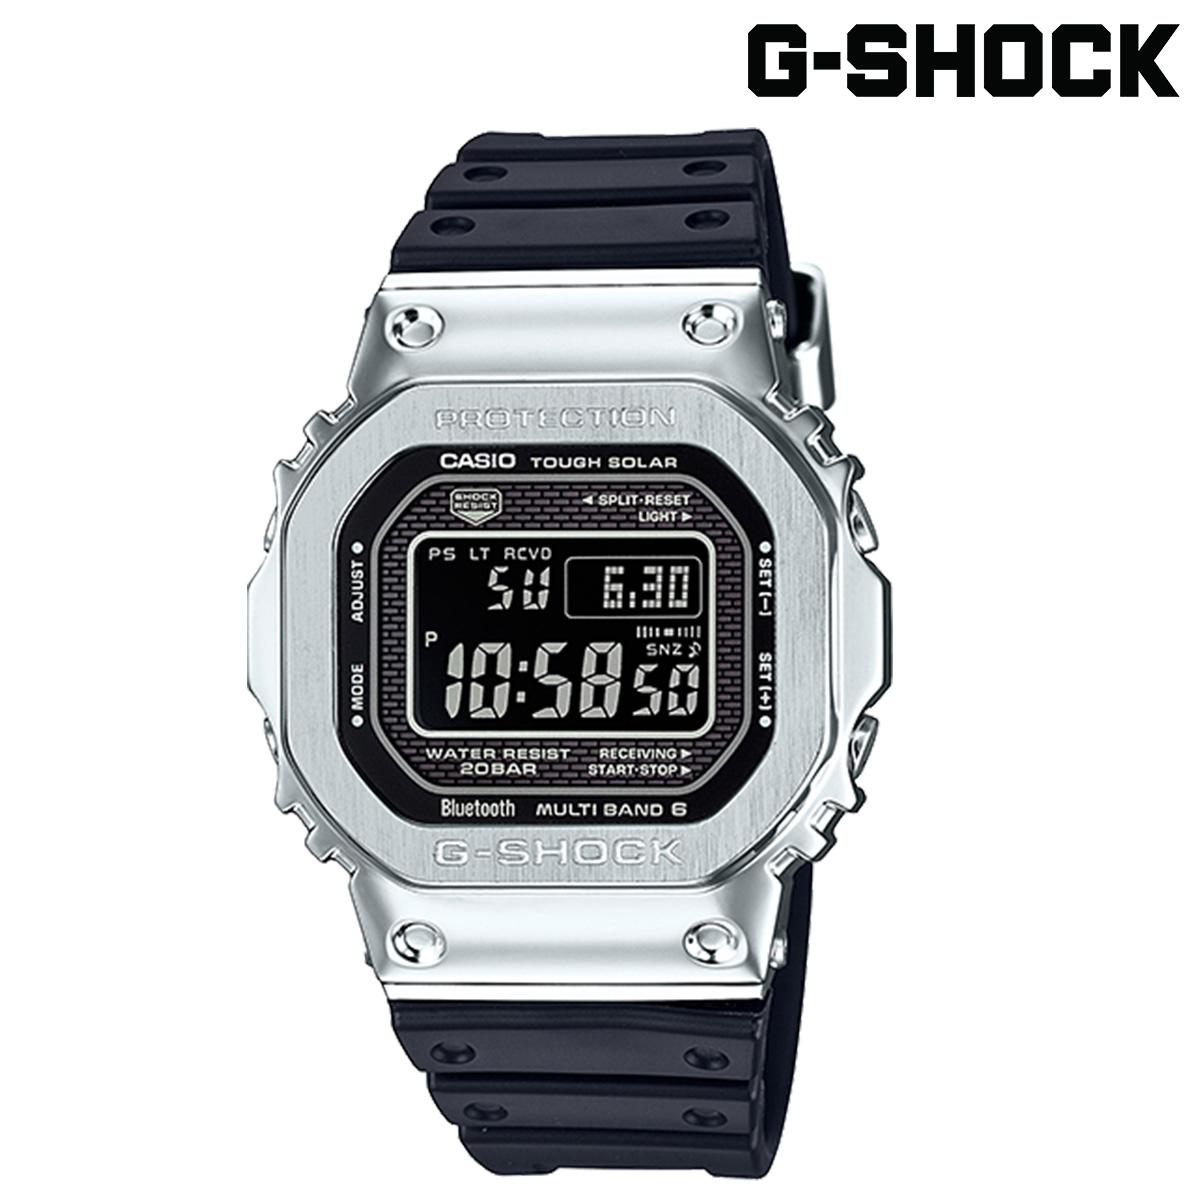 Casio Casio G Shock Watch Gmw B5000 1jf ジーショック G Shock G Shock Silver Men Gap Dis